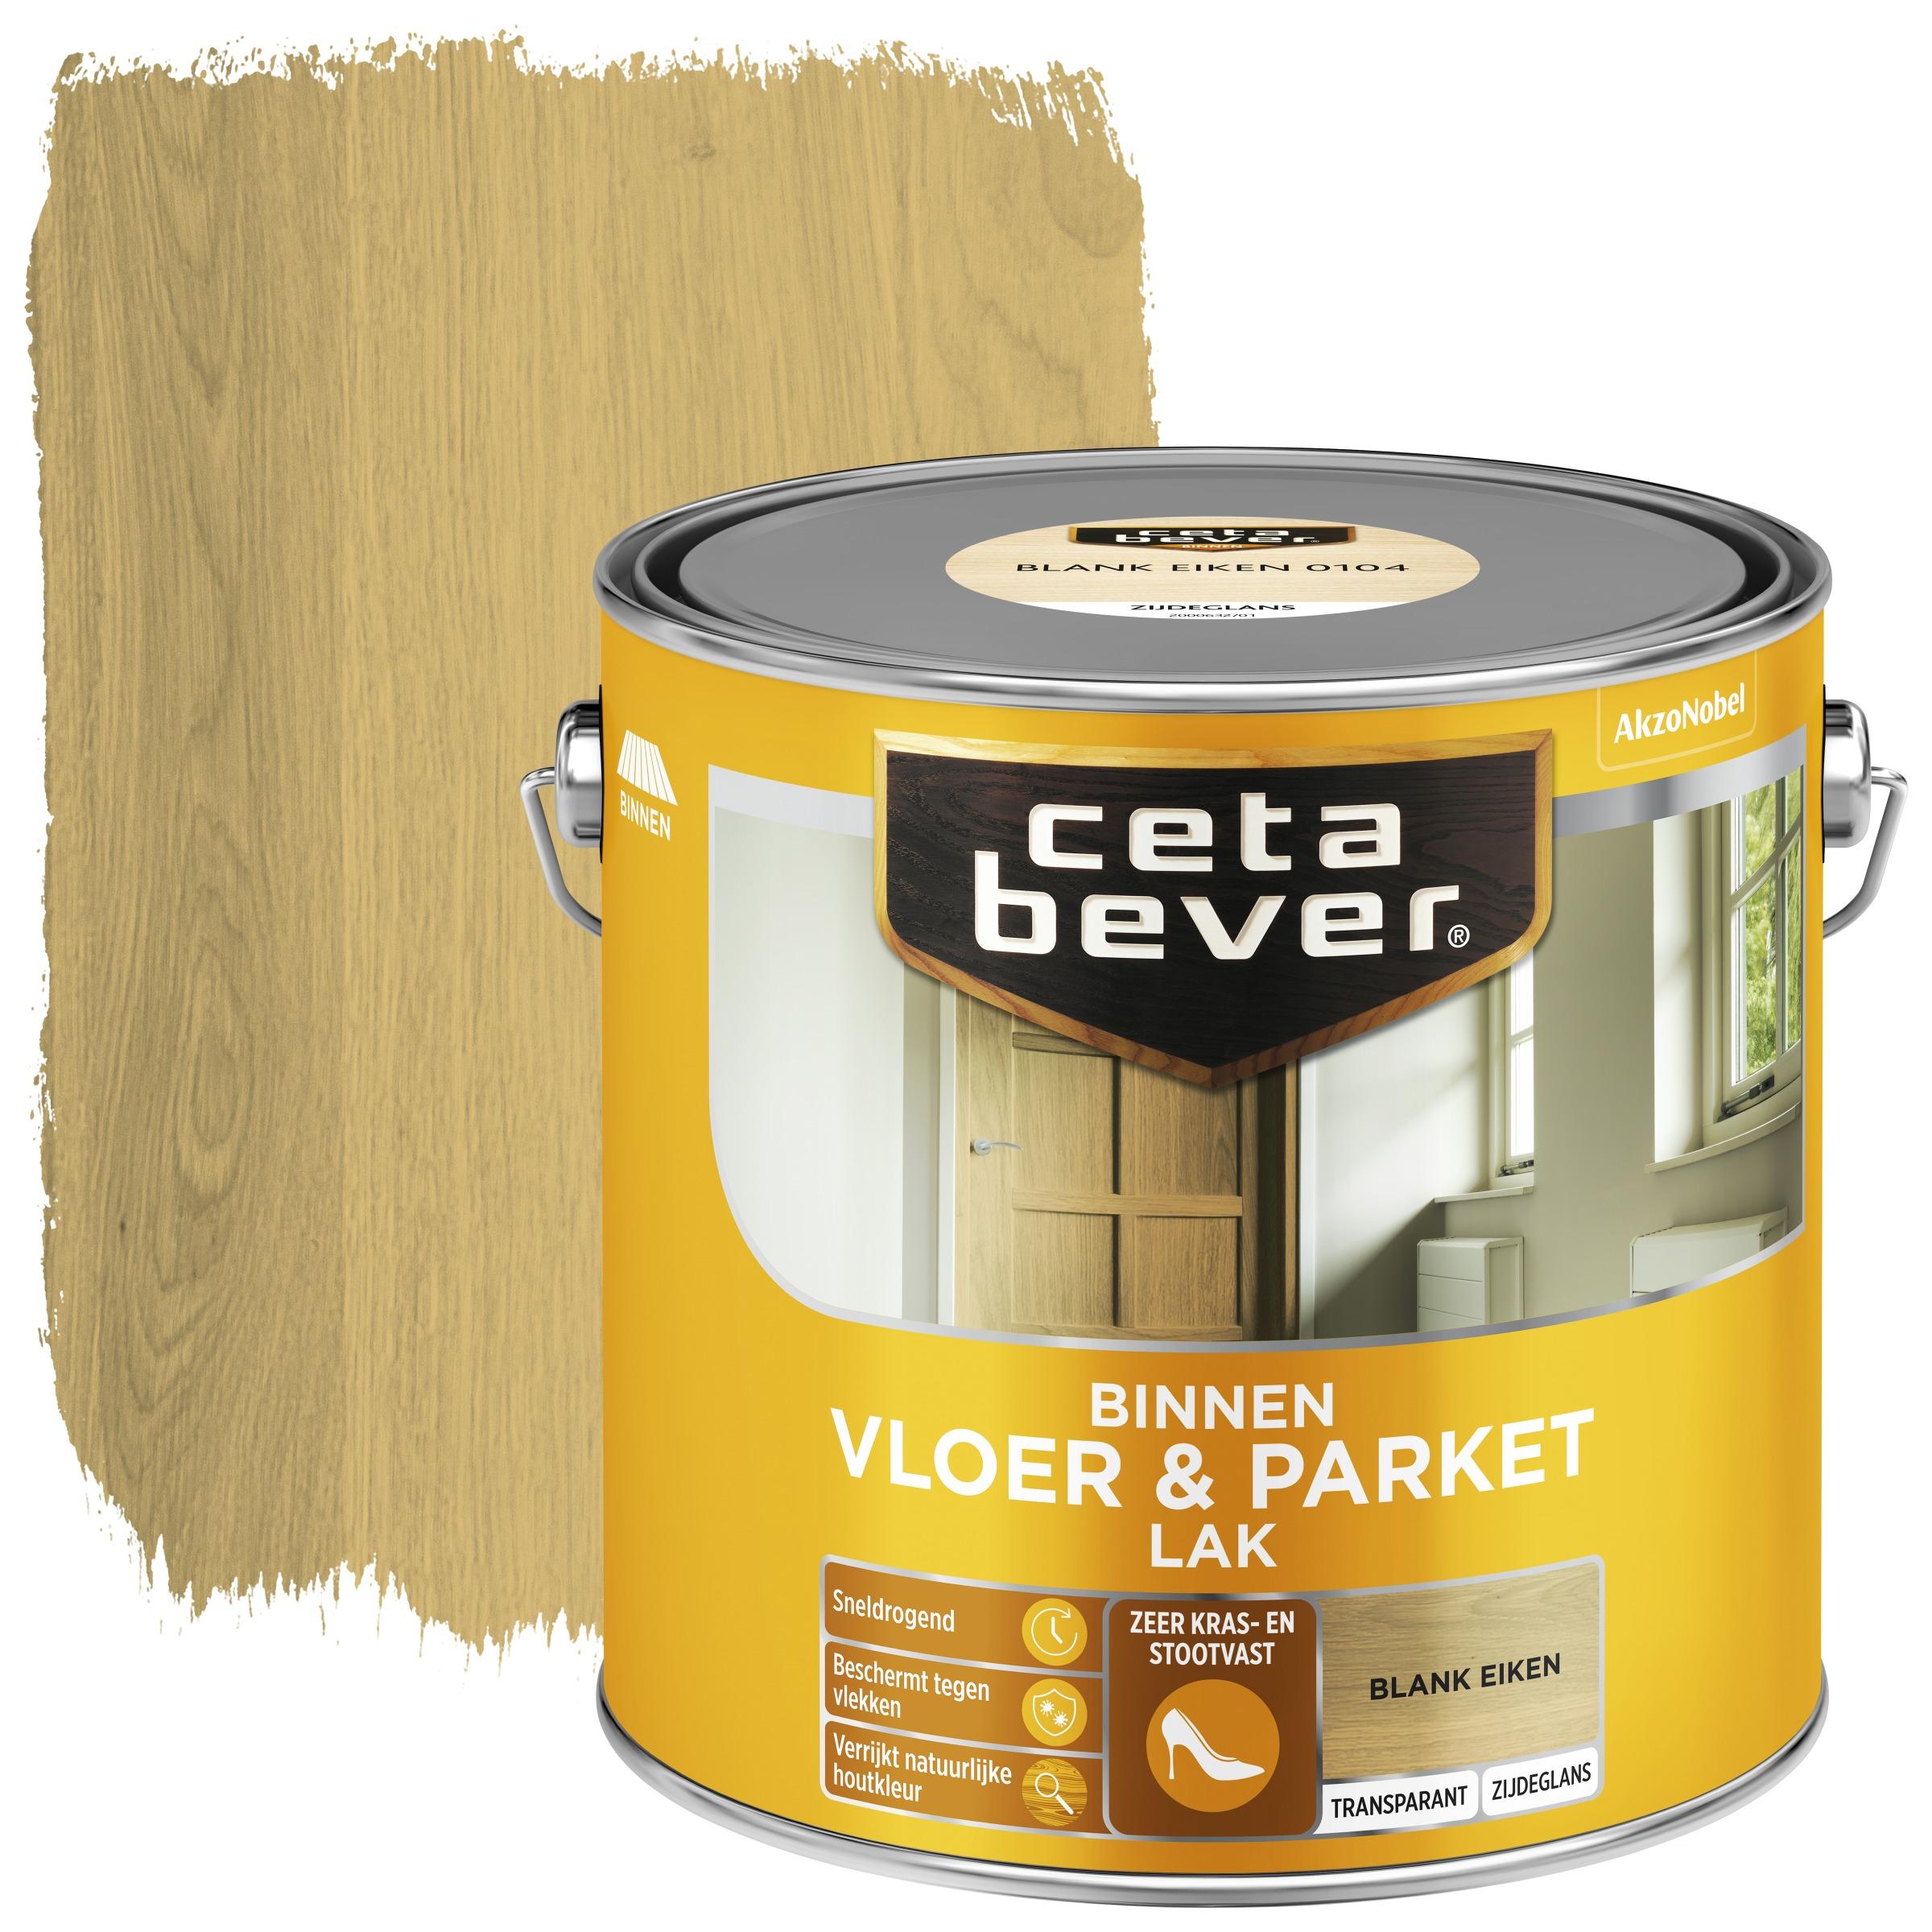 Cetabever vloer- & parketlak transparant blank eiken zijdeglans 2,5 l